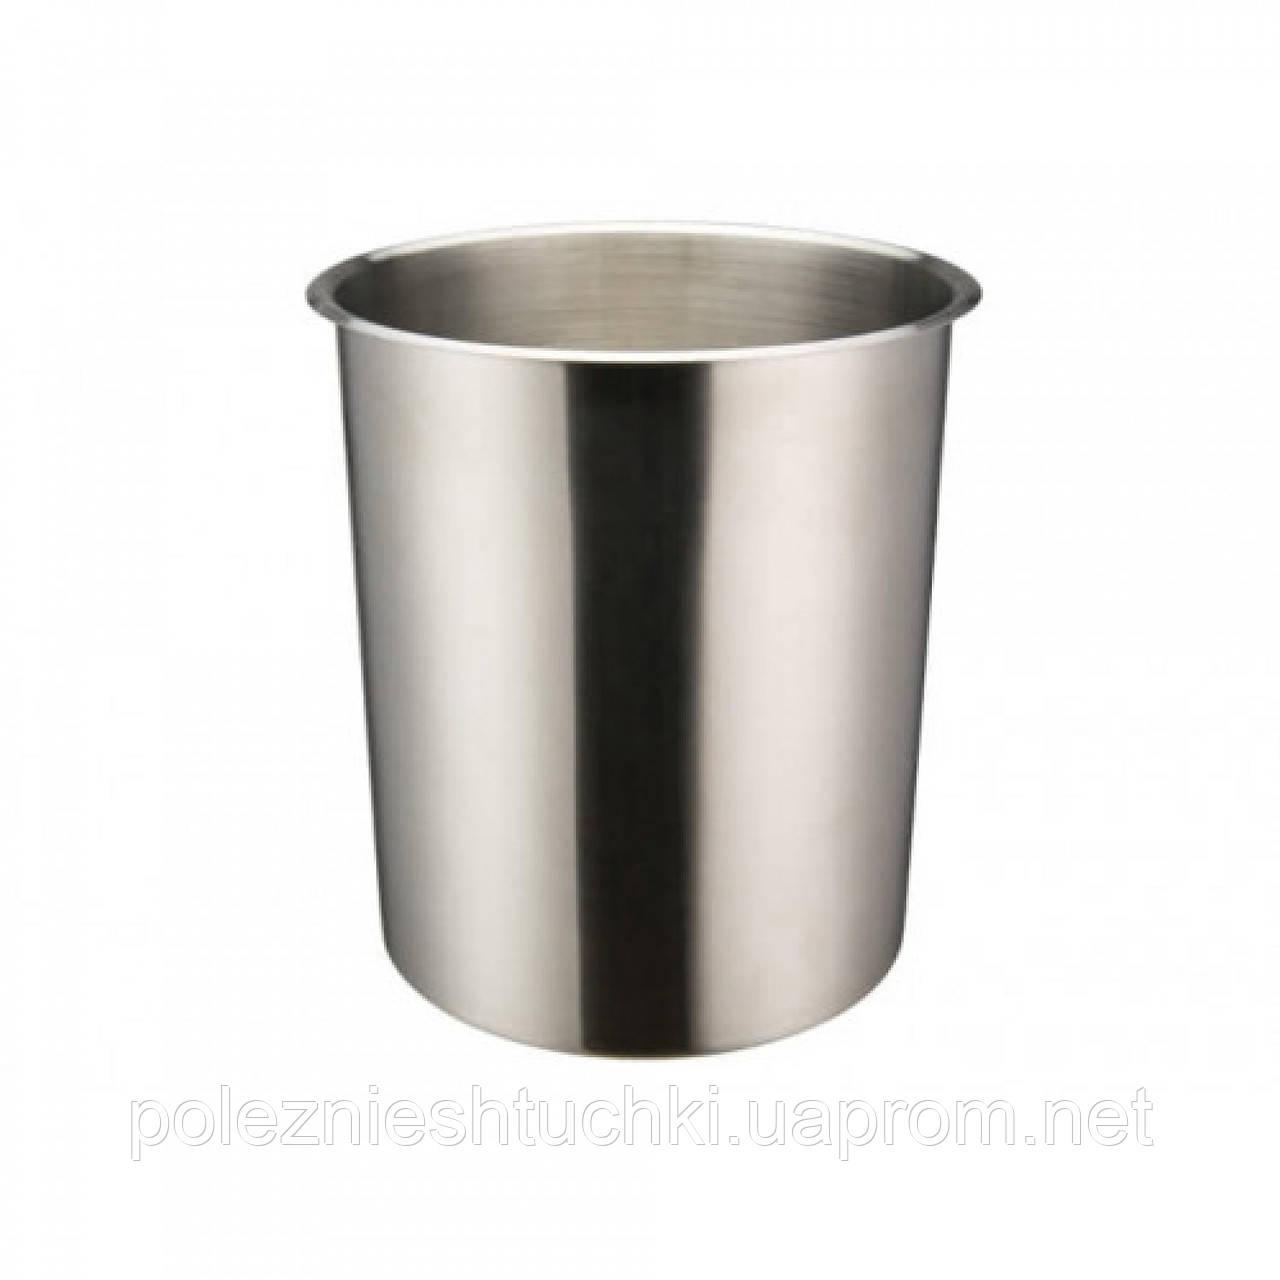 Ведро для льда 7,8 л, нержавеющая сталь, BAMN-8.25 Winco Prime